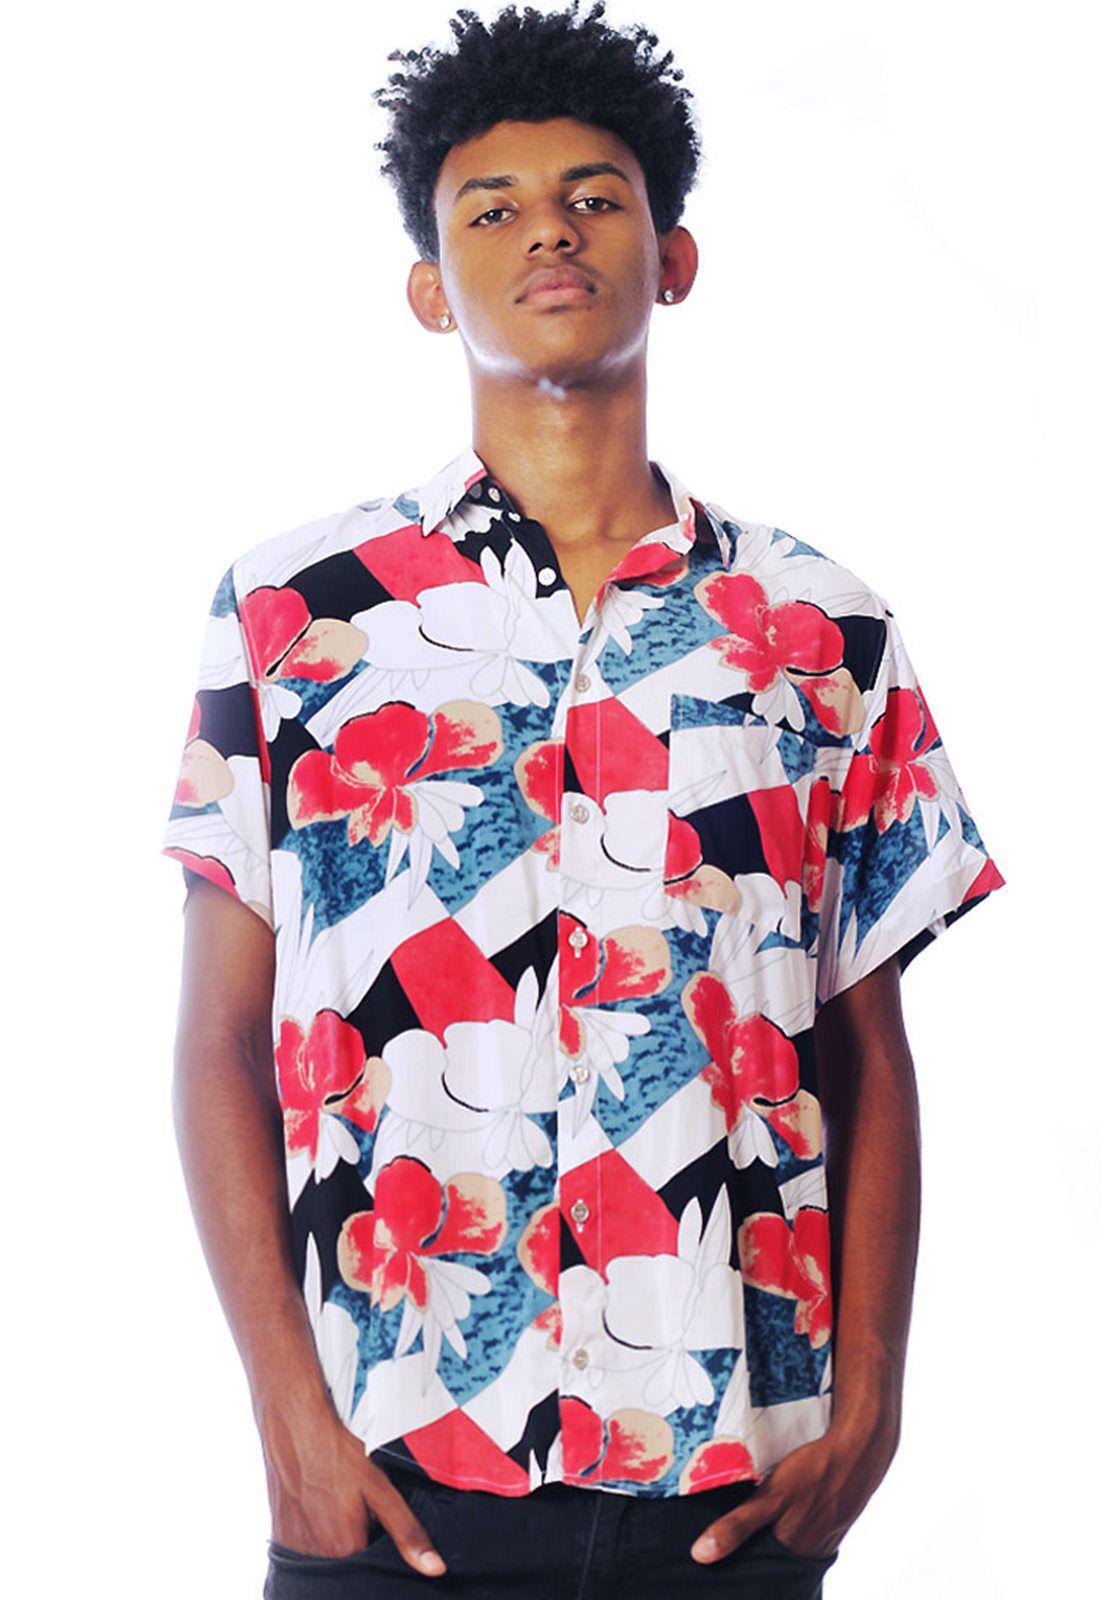 Camisa Floral Estampada ElephunK Unissex Hallerbos Vermelha